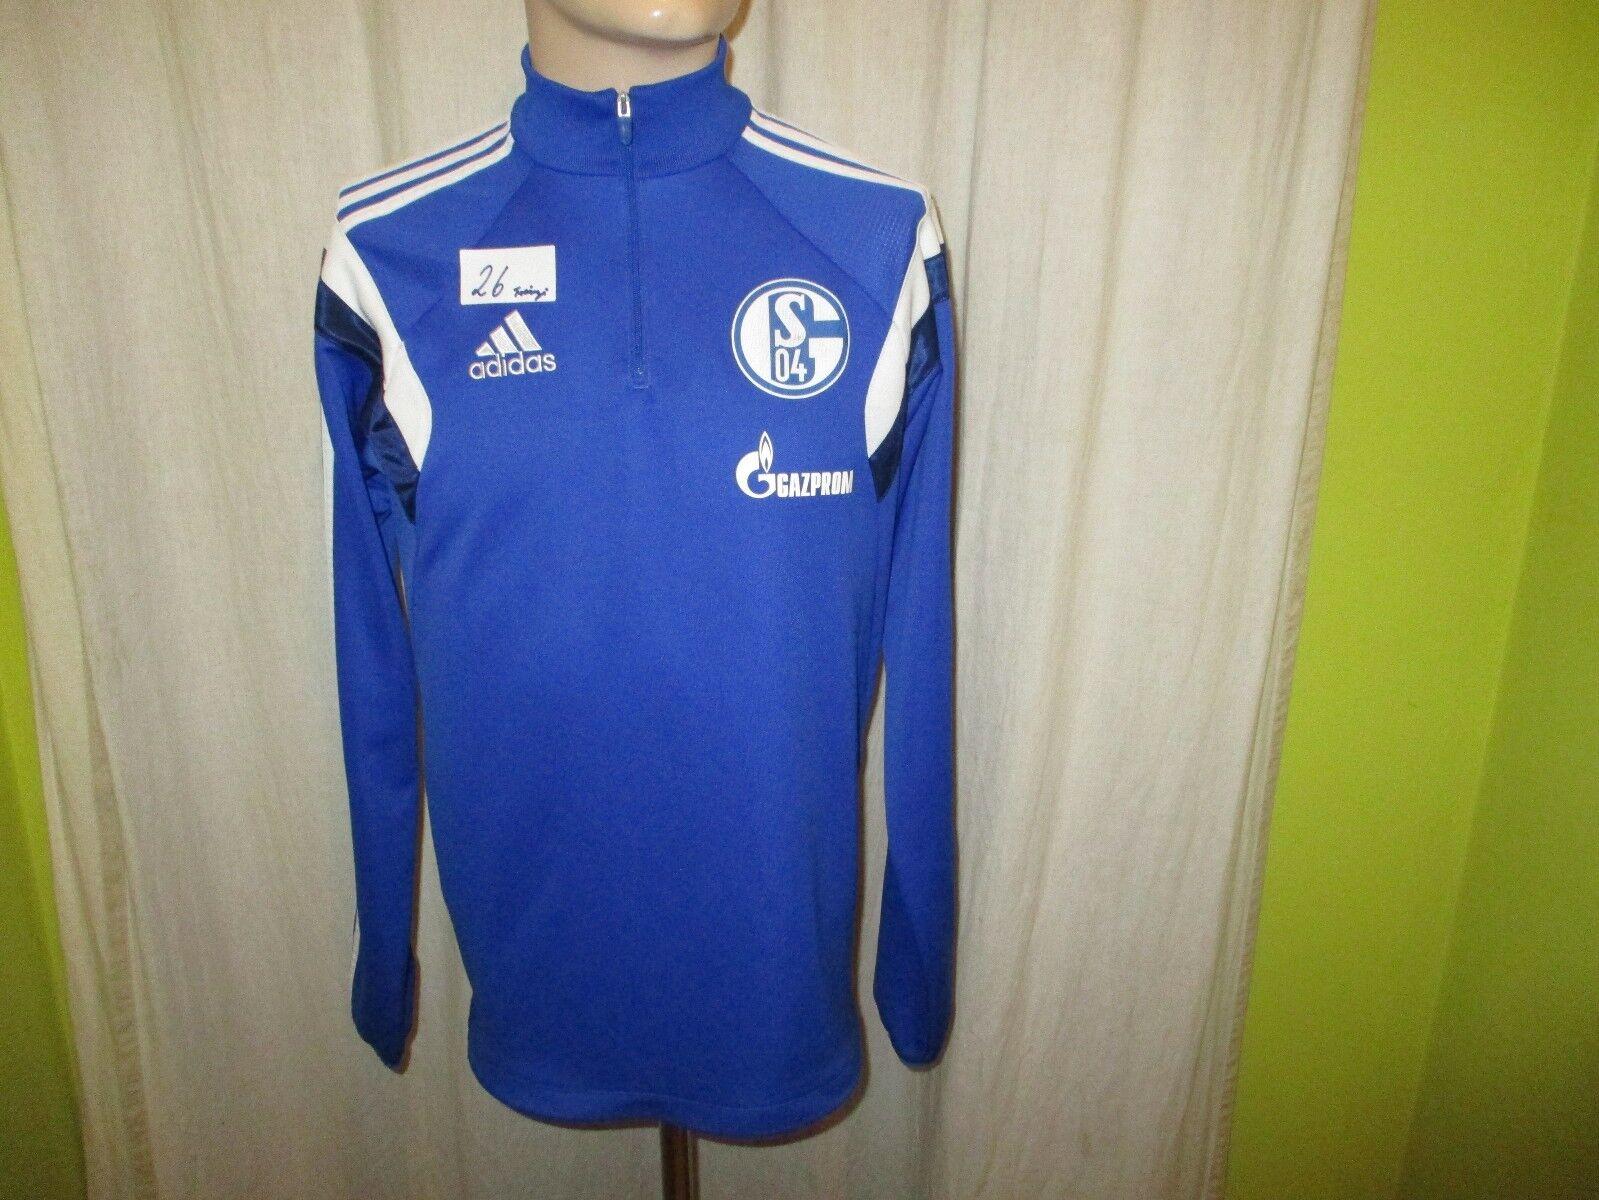 FC Schalke 04 Adidas Spieler Freizeit-Training Zipper Jacke 2014 15 Gr.S TOP